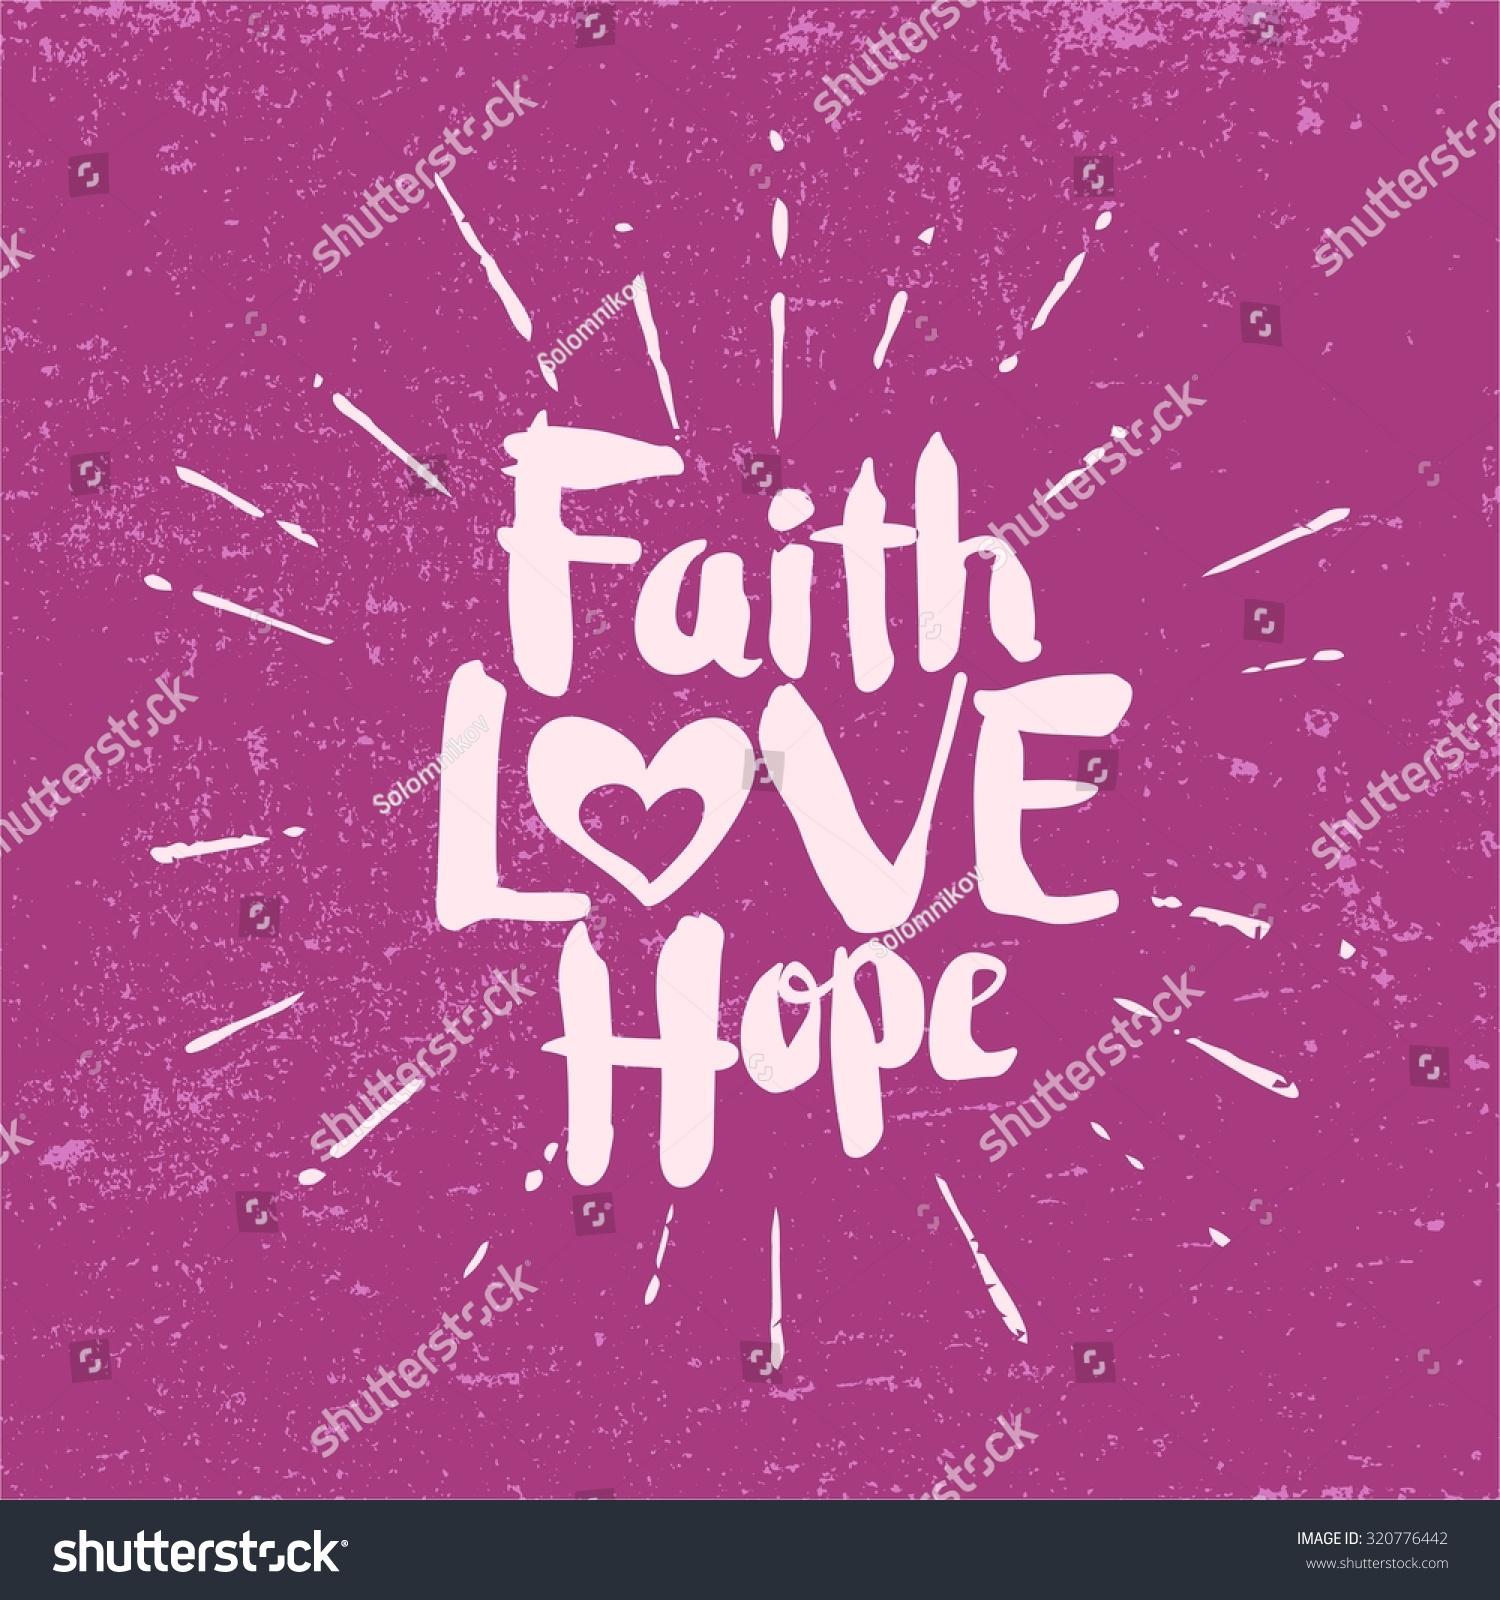 Faith hope love stock vector 320776442 shutterstock - Faith love hope pictures ...